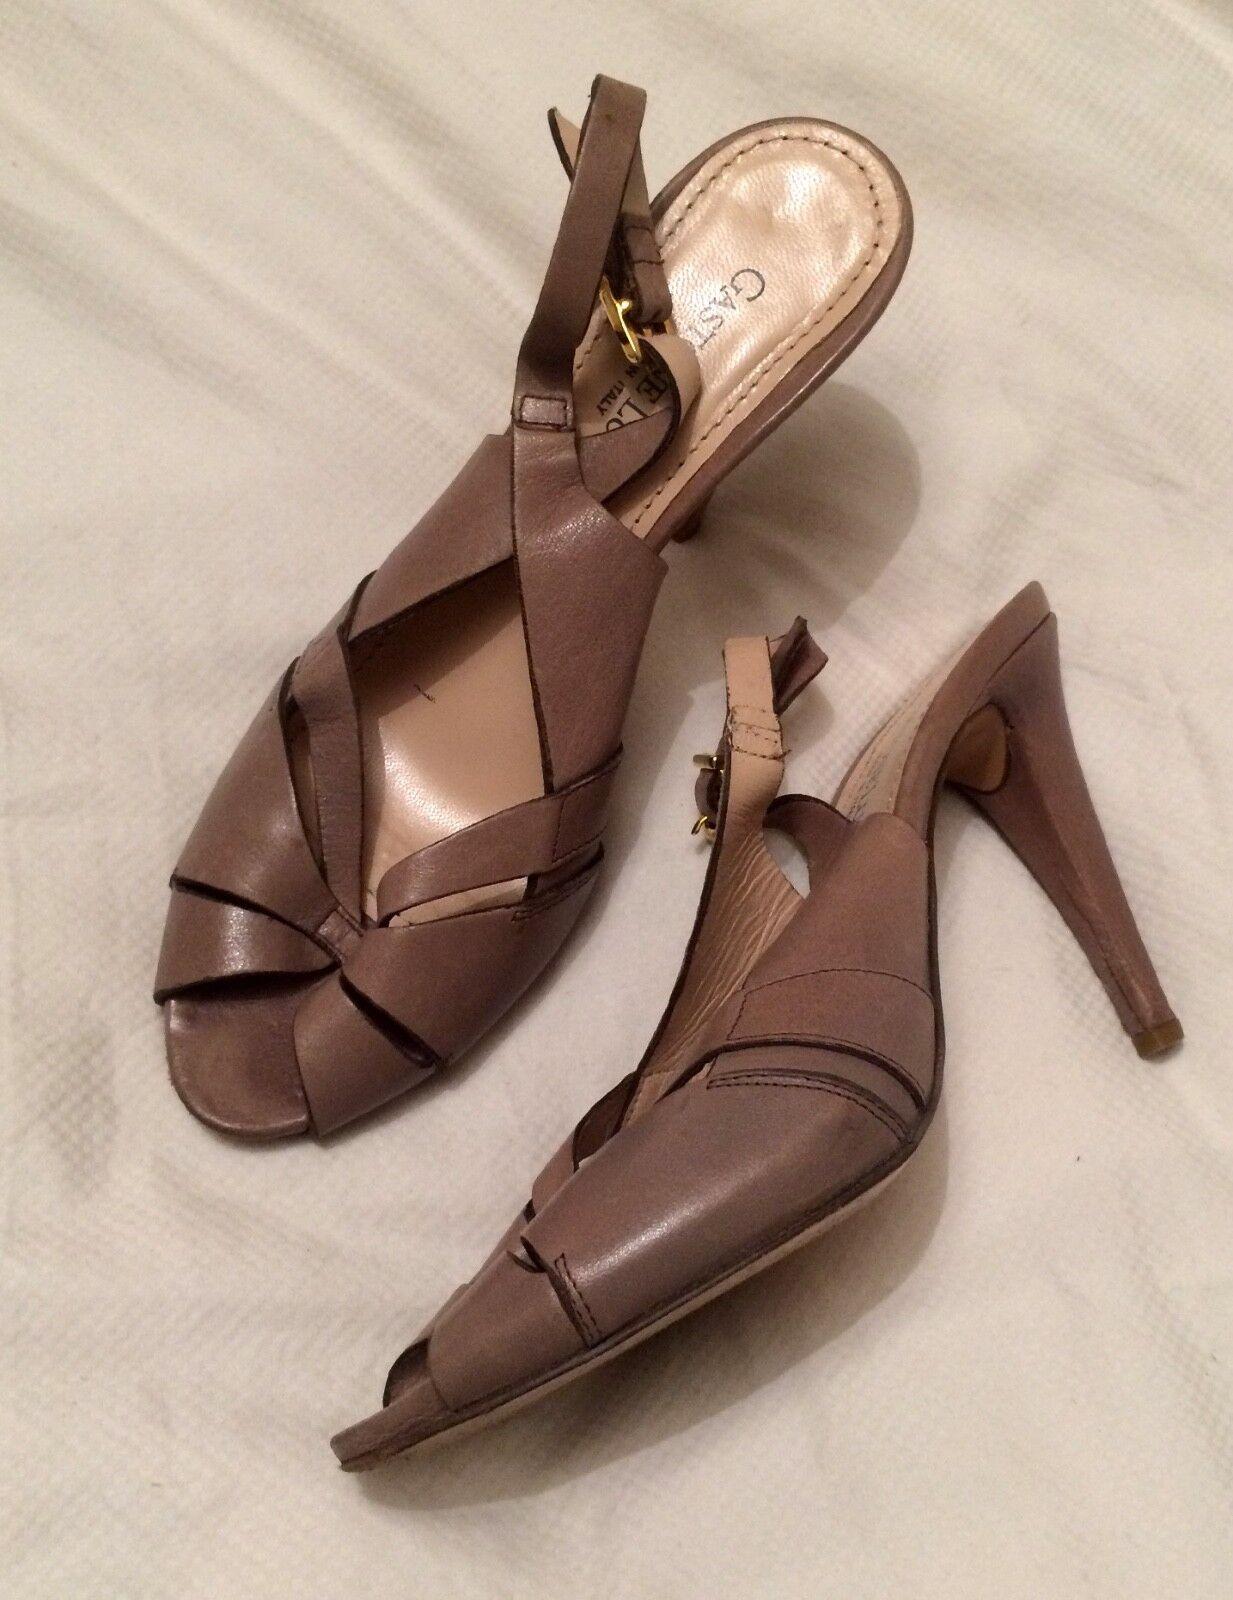 GASTONE LUCIOLI Nude Leather Open Toe Strap Mid-Heel Sandals -size eu 39   uk 6